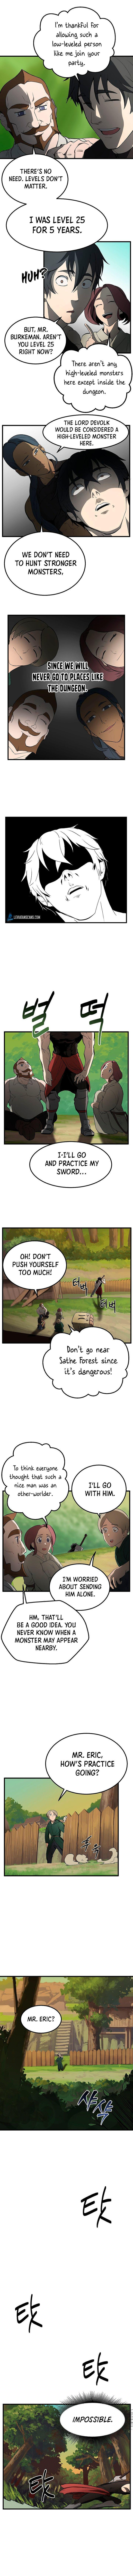 Survival Story Of A Sword King In A Fantasy World Chapter 6 page 9 - Mangakakalots.com